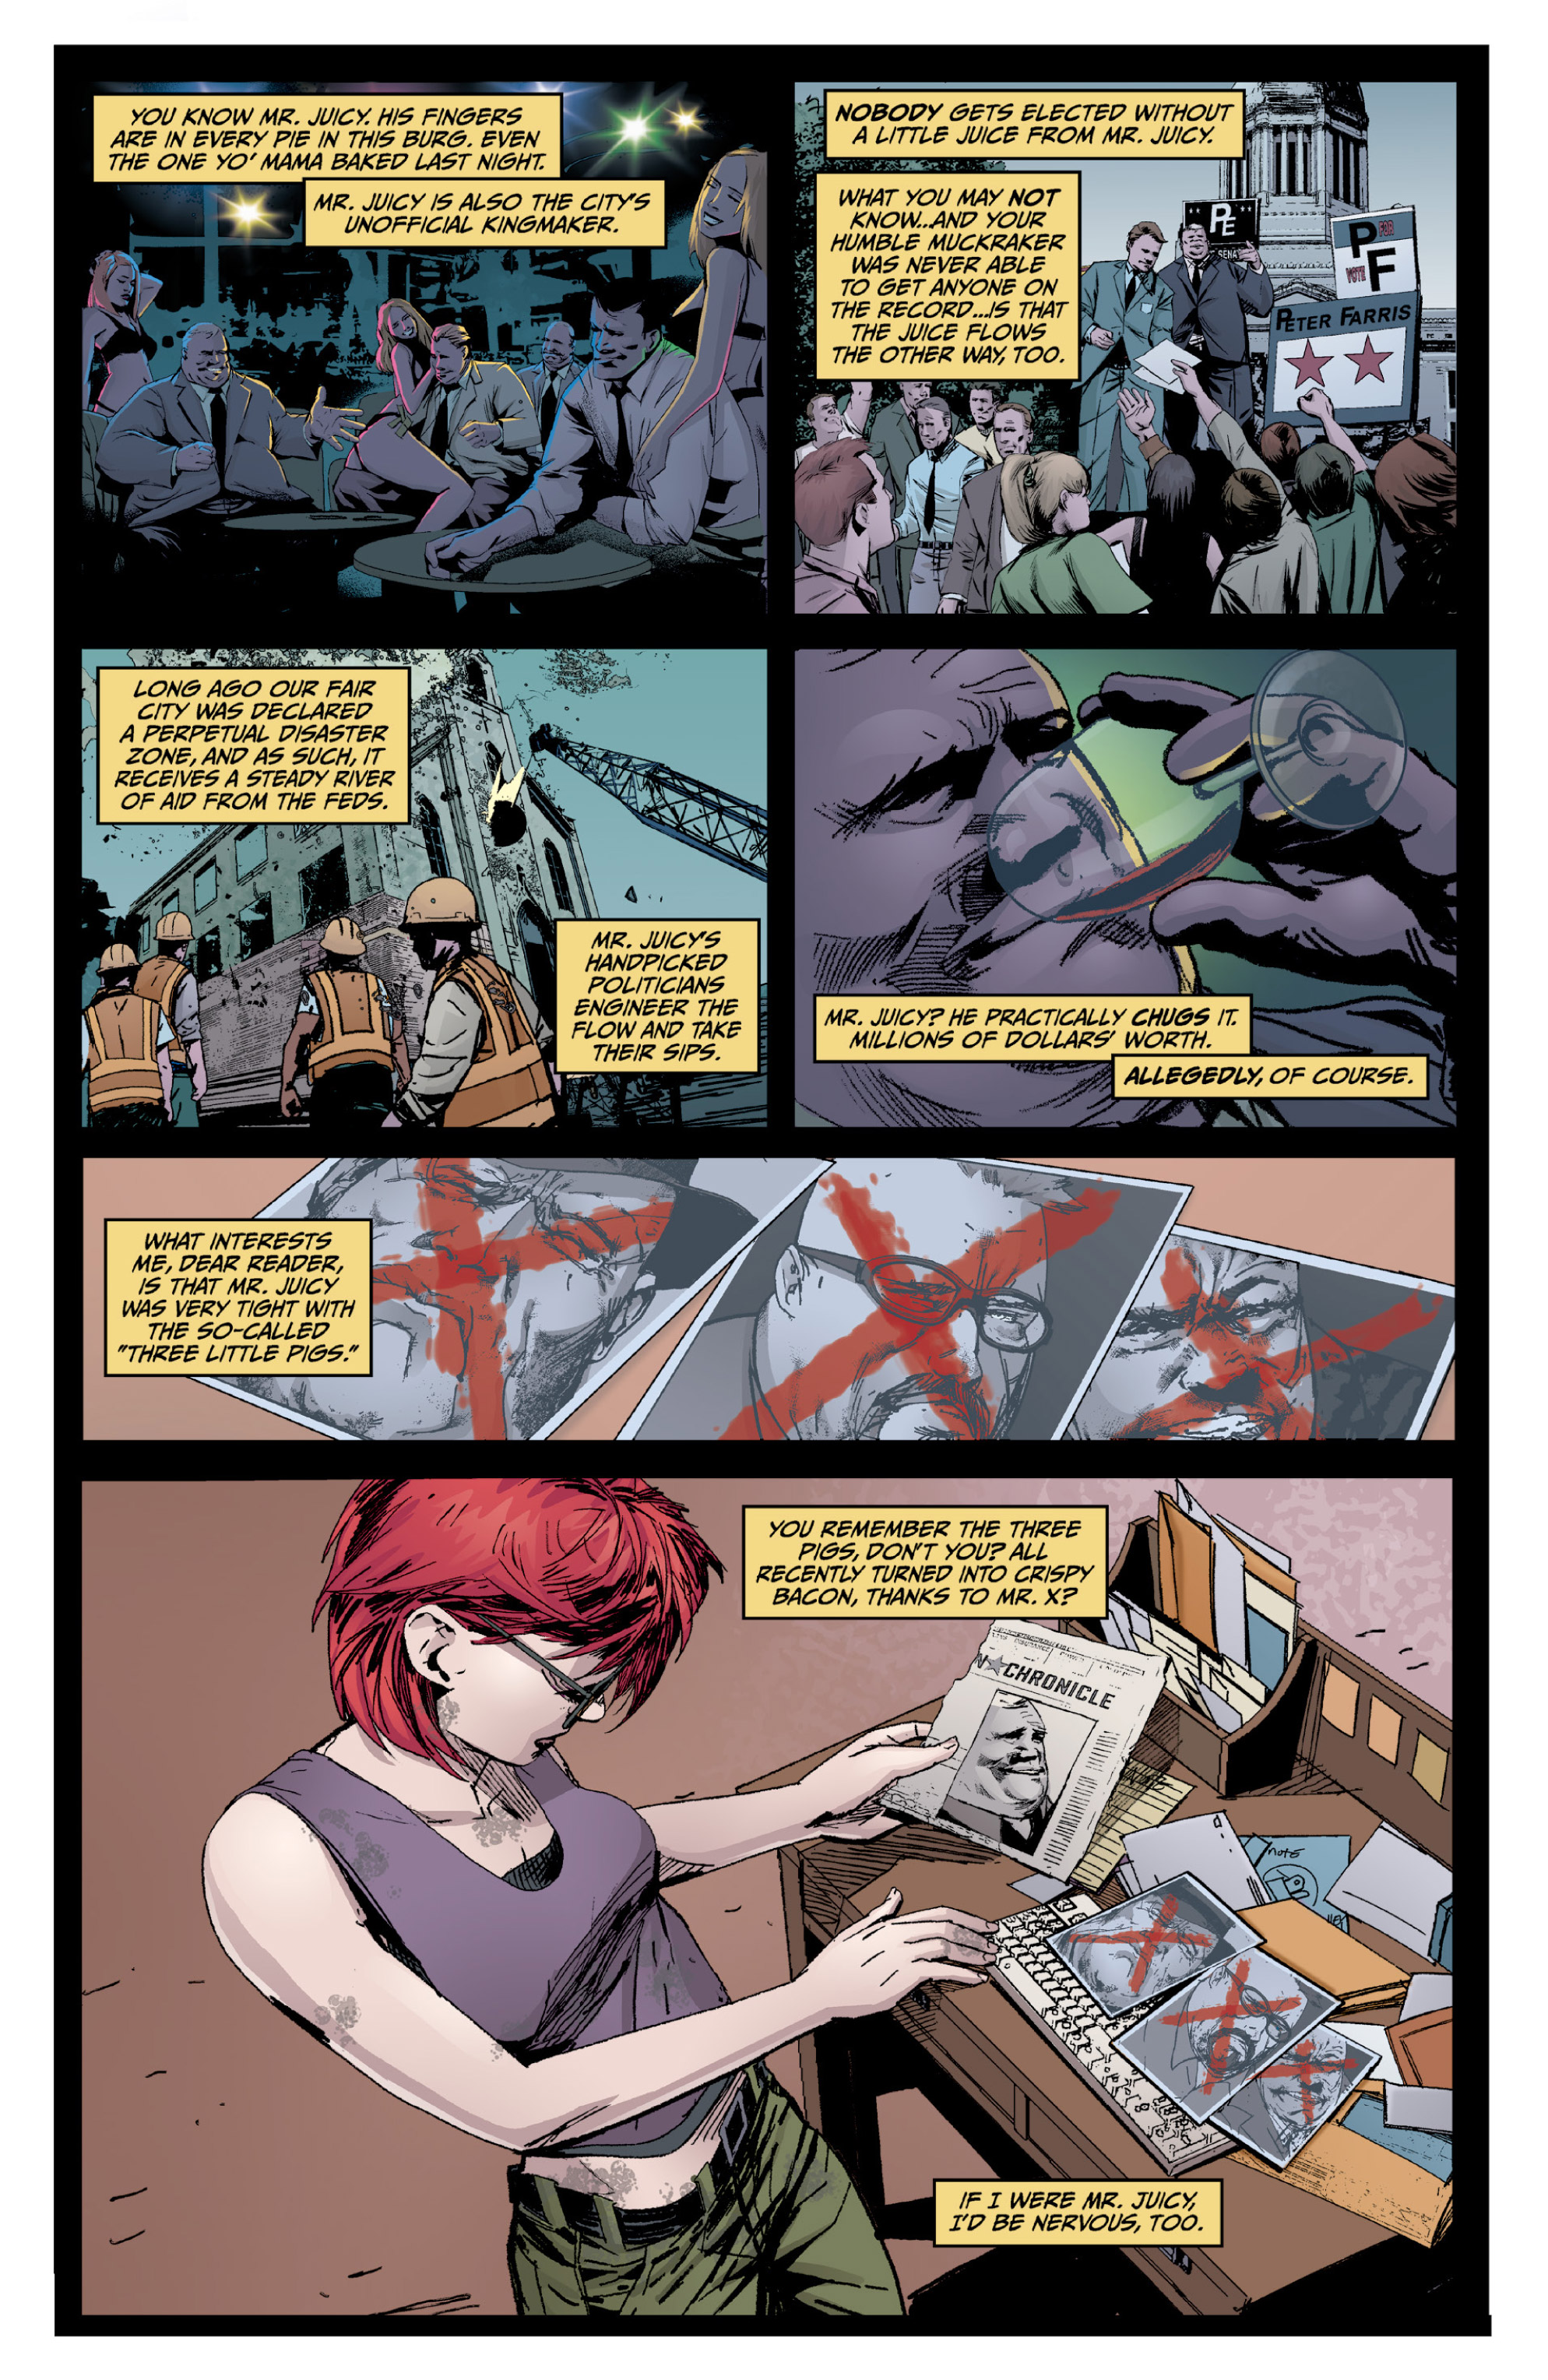 Read online X: Big Bad comic -  Issue # Full - 64